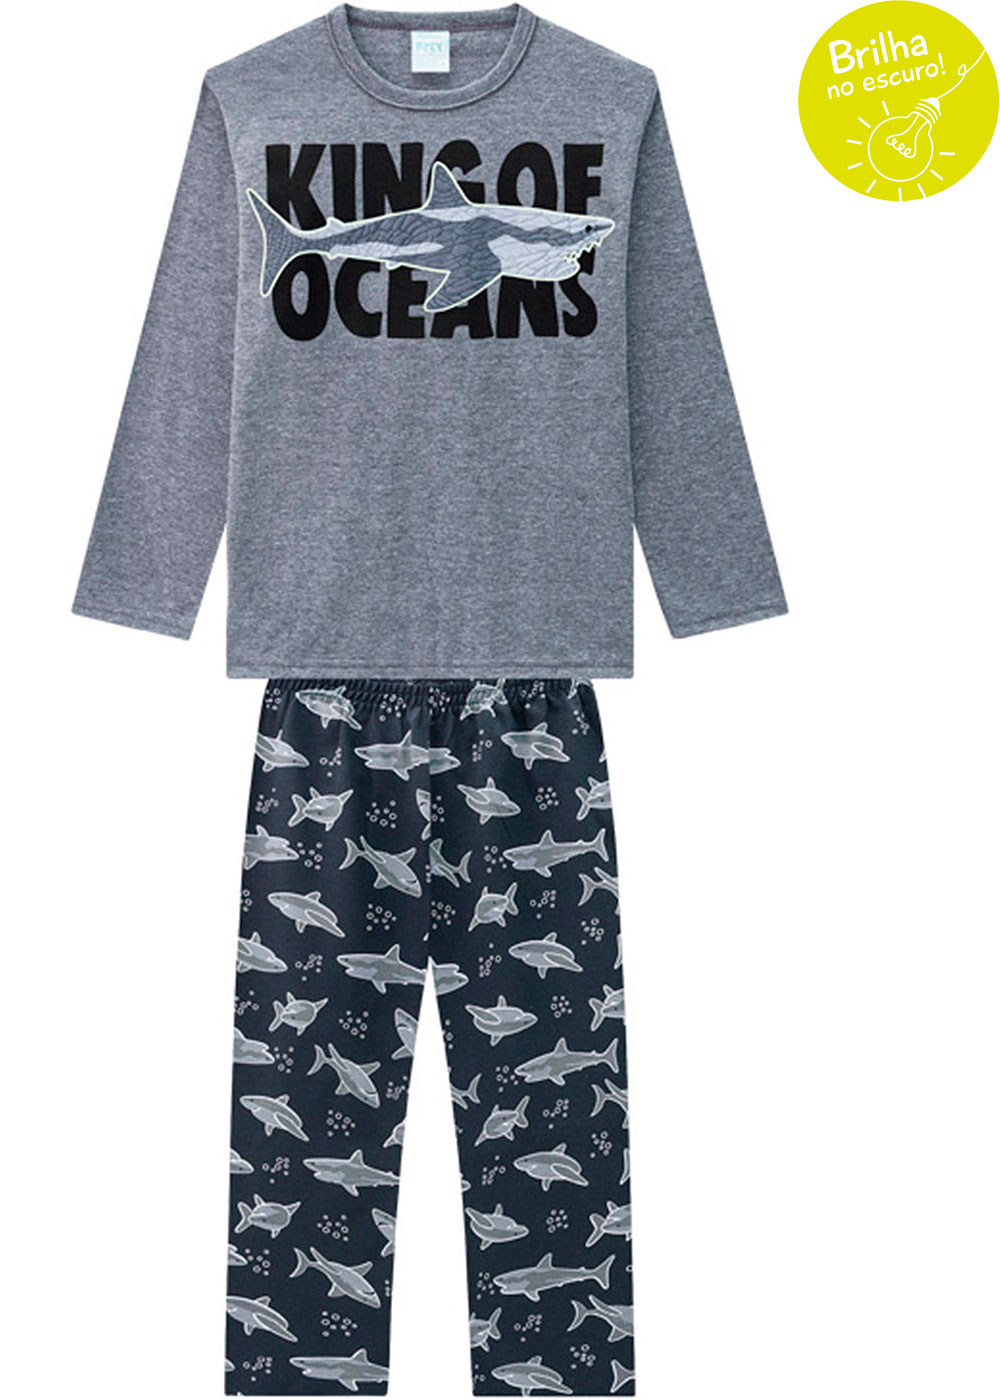 Pijama Infantil Masculino Cinza Brilha no Escuro Inverno Kyly